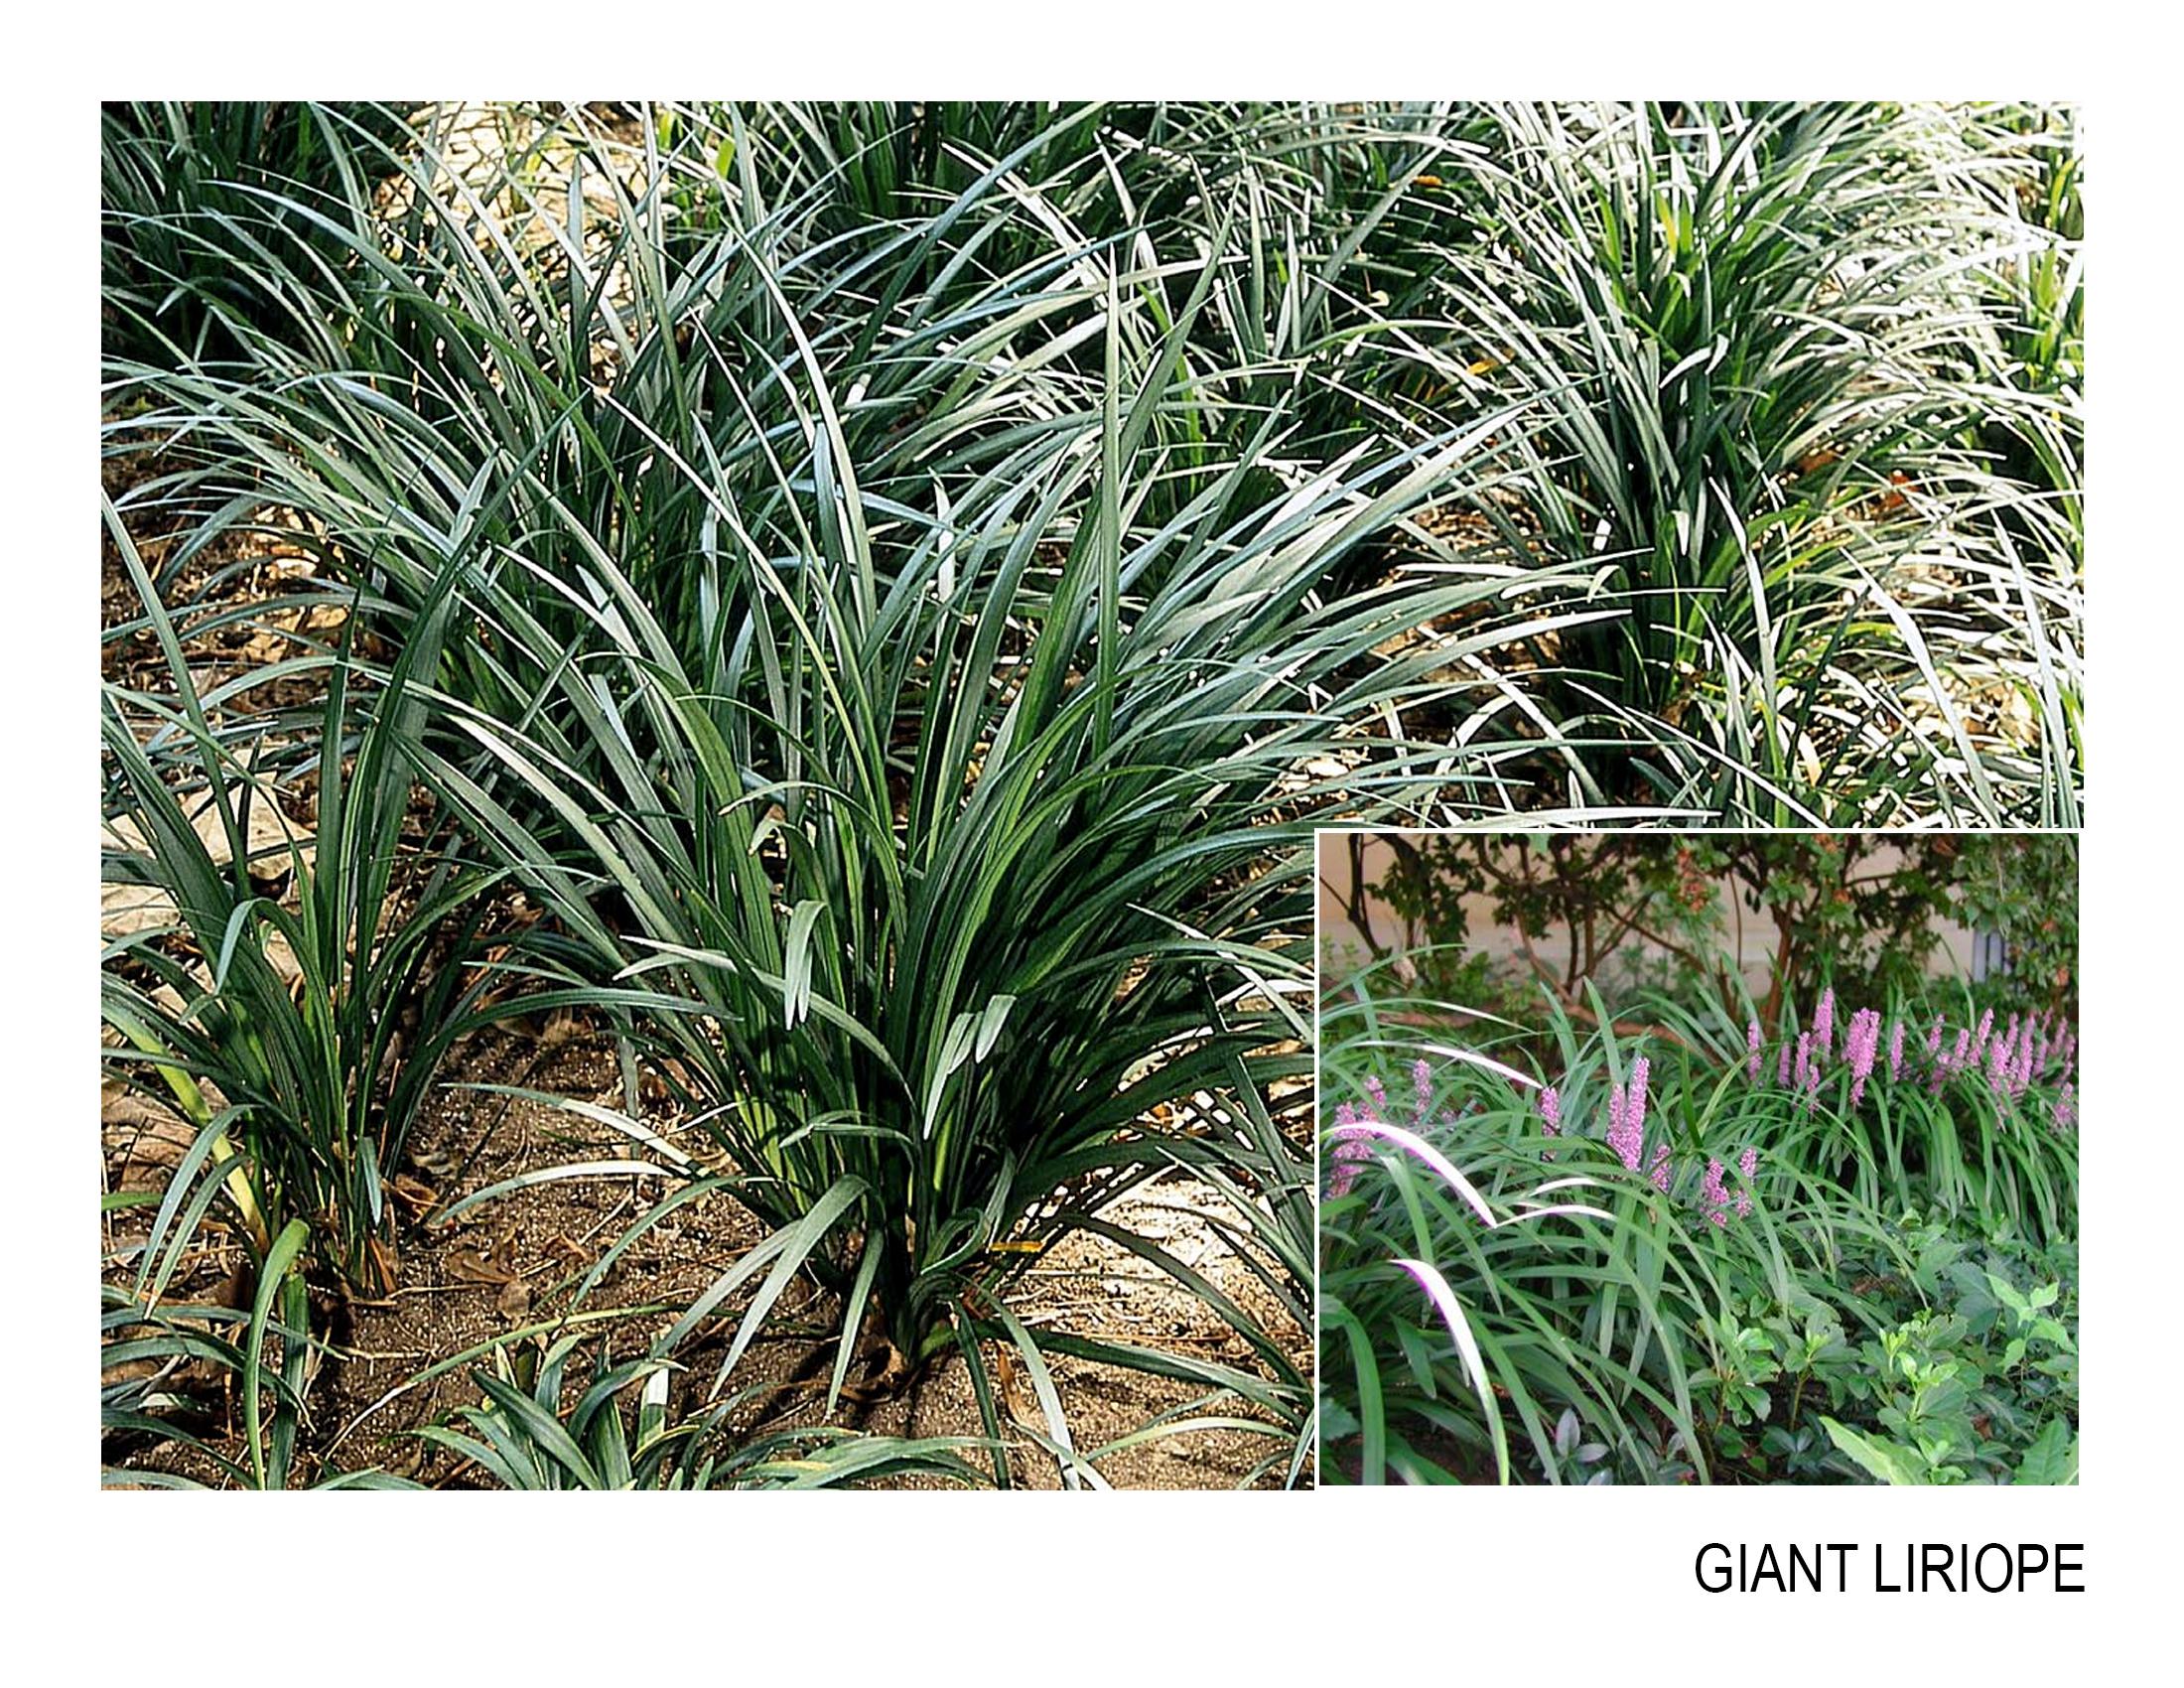 giant liriope.jpg